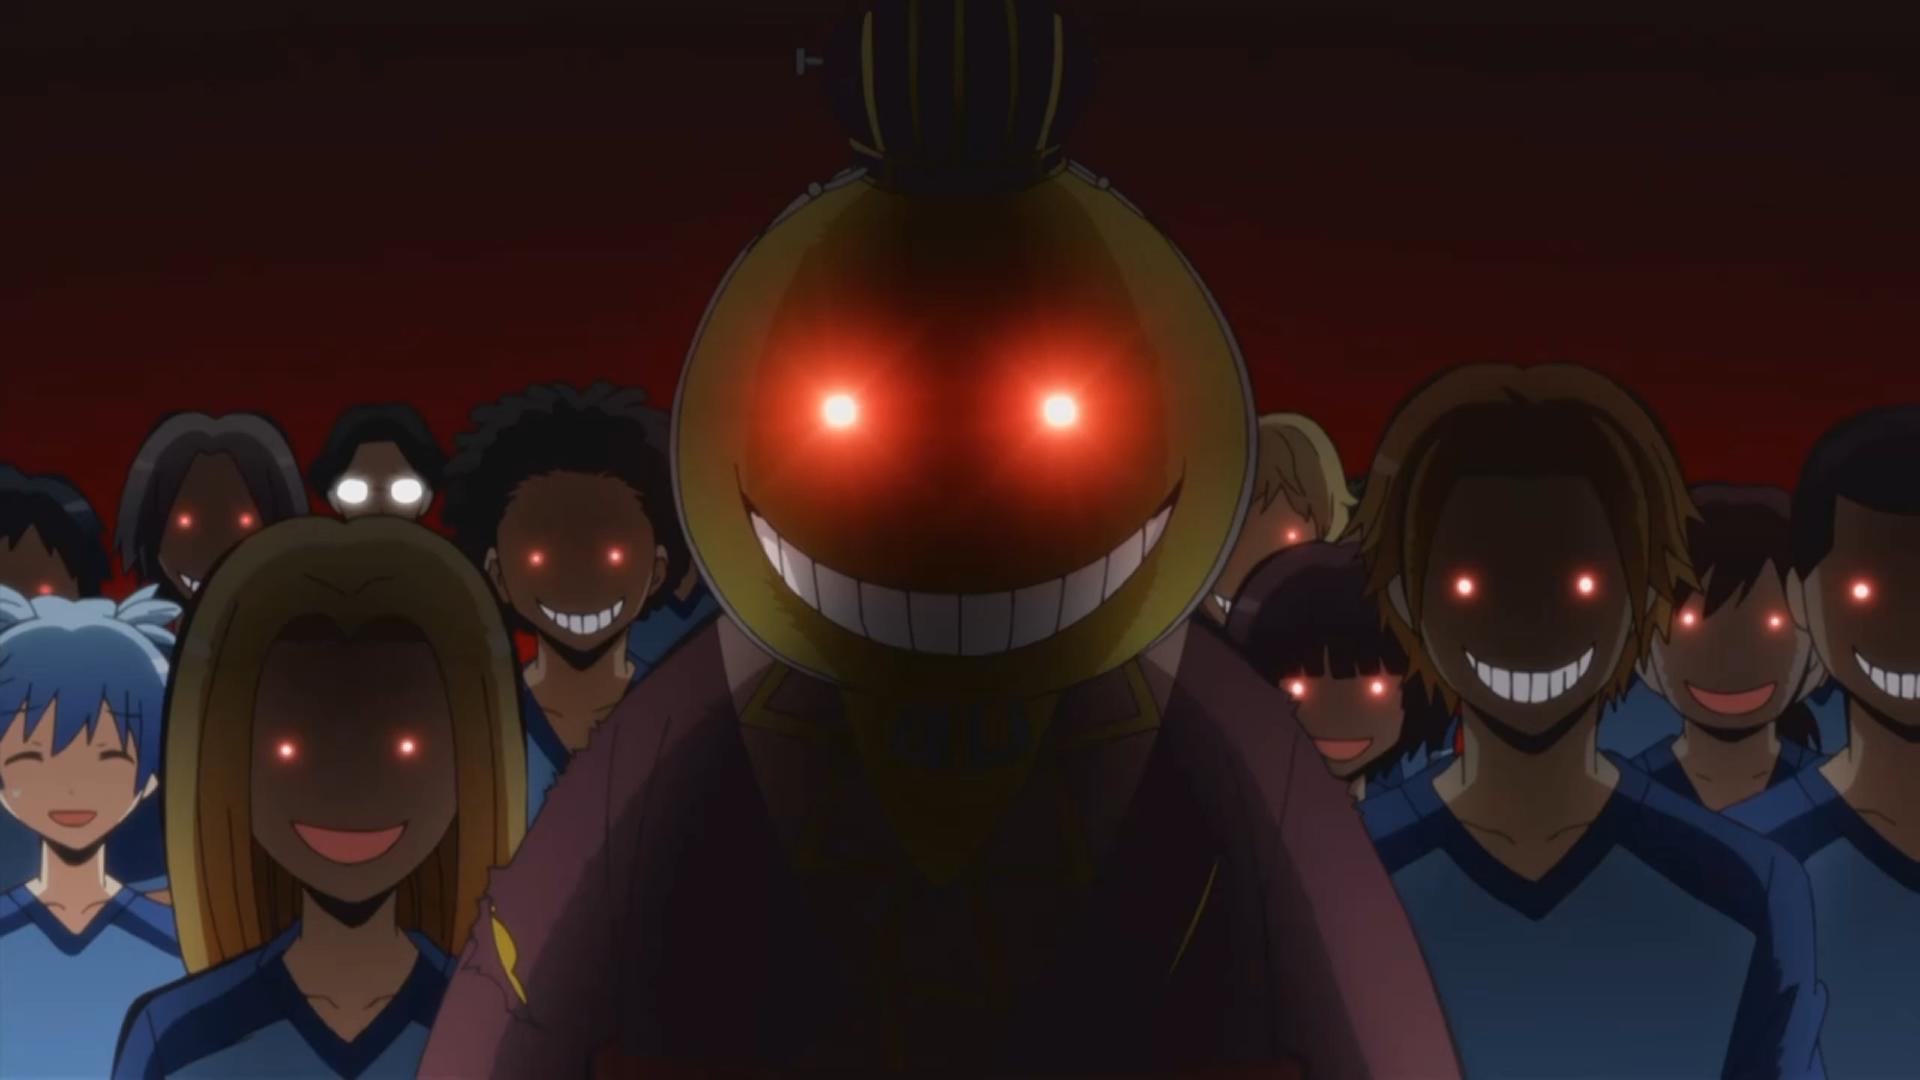 Wallpaper Evil Koro Sensei Midnight Assassination Classroom